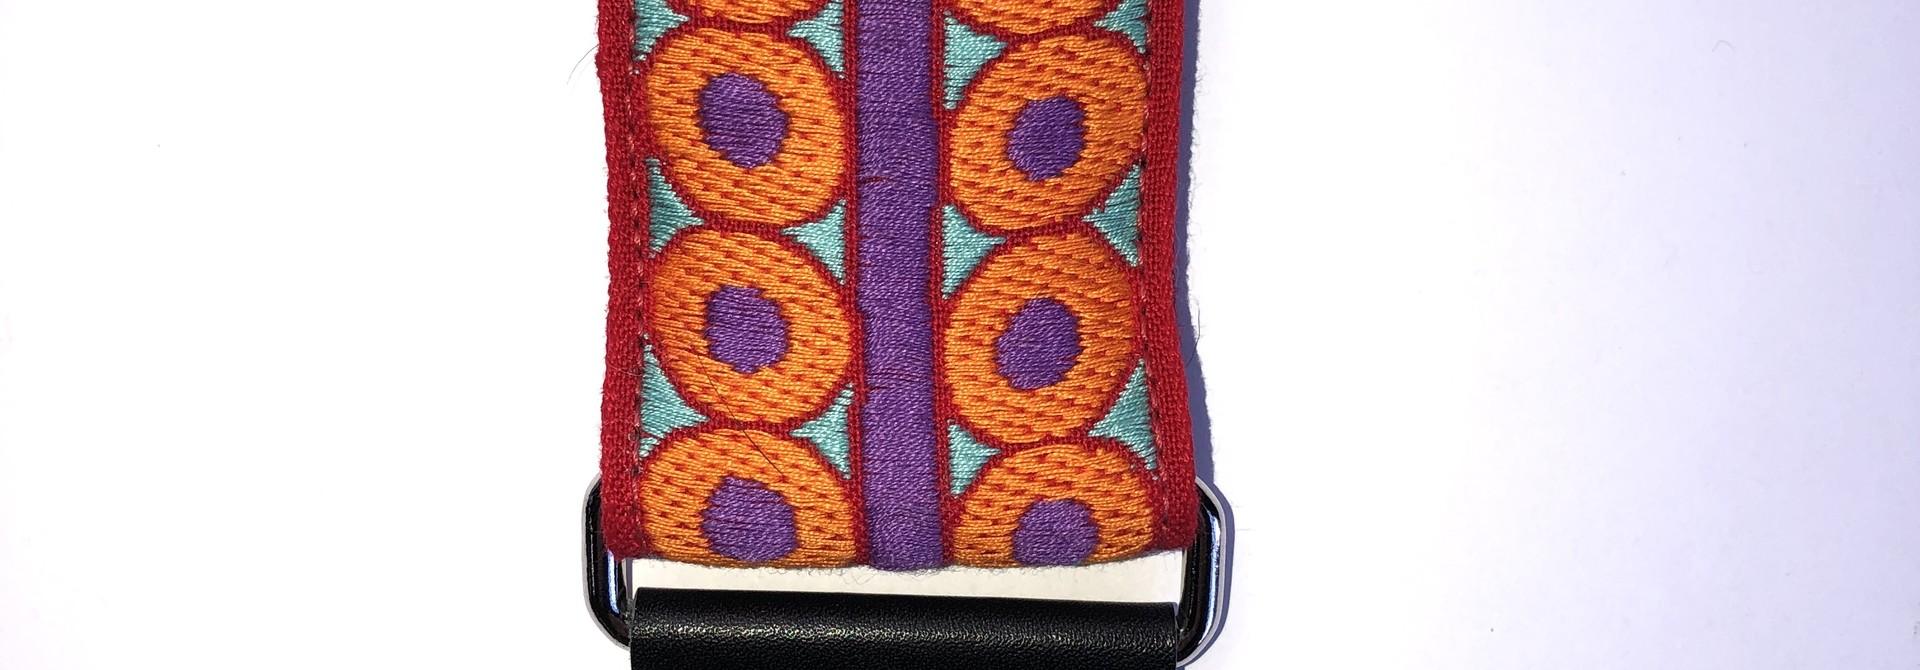 Tremolo Leather Co. Orange Spaghettios Vintage Strap